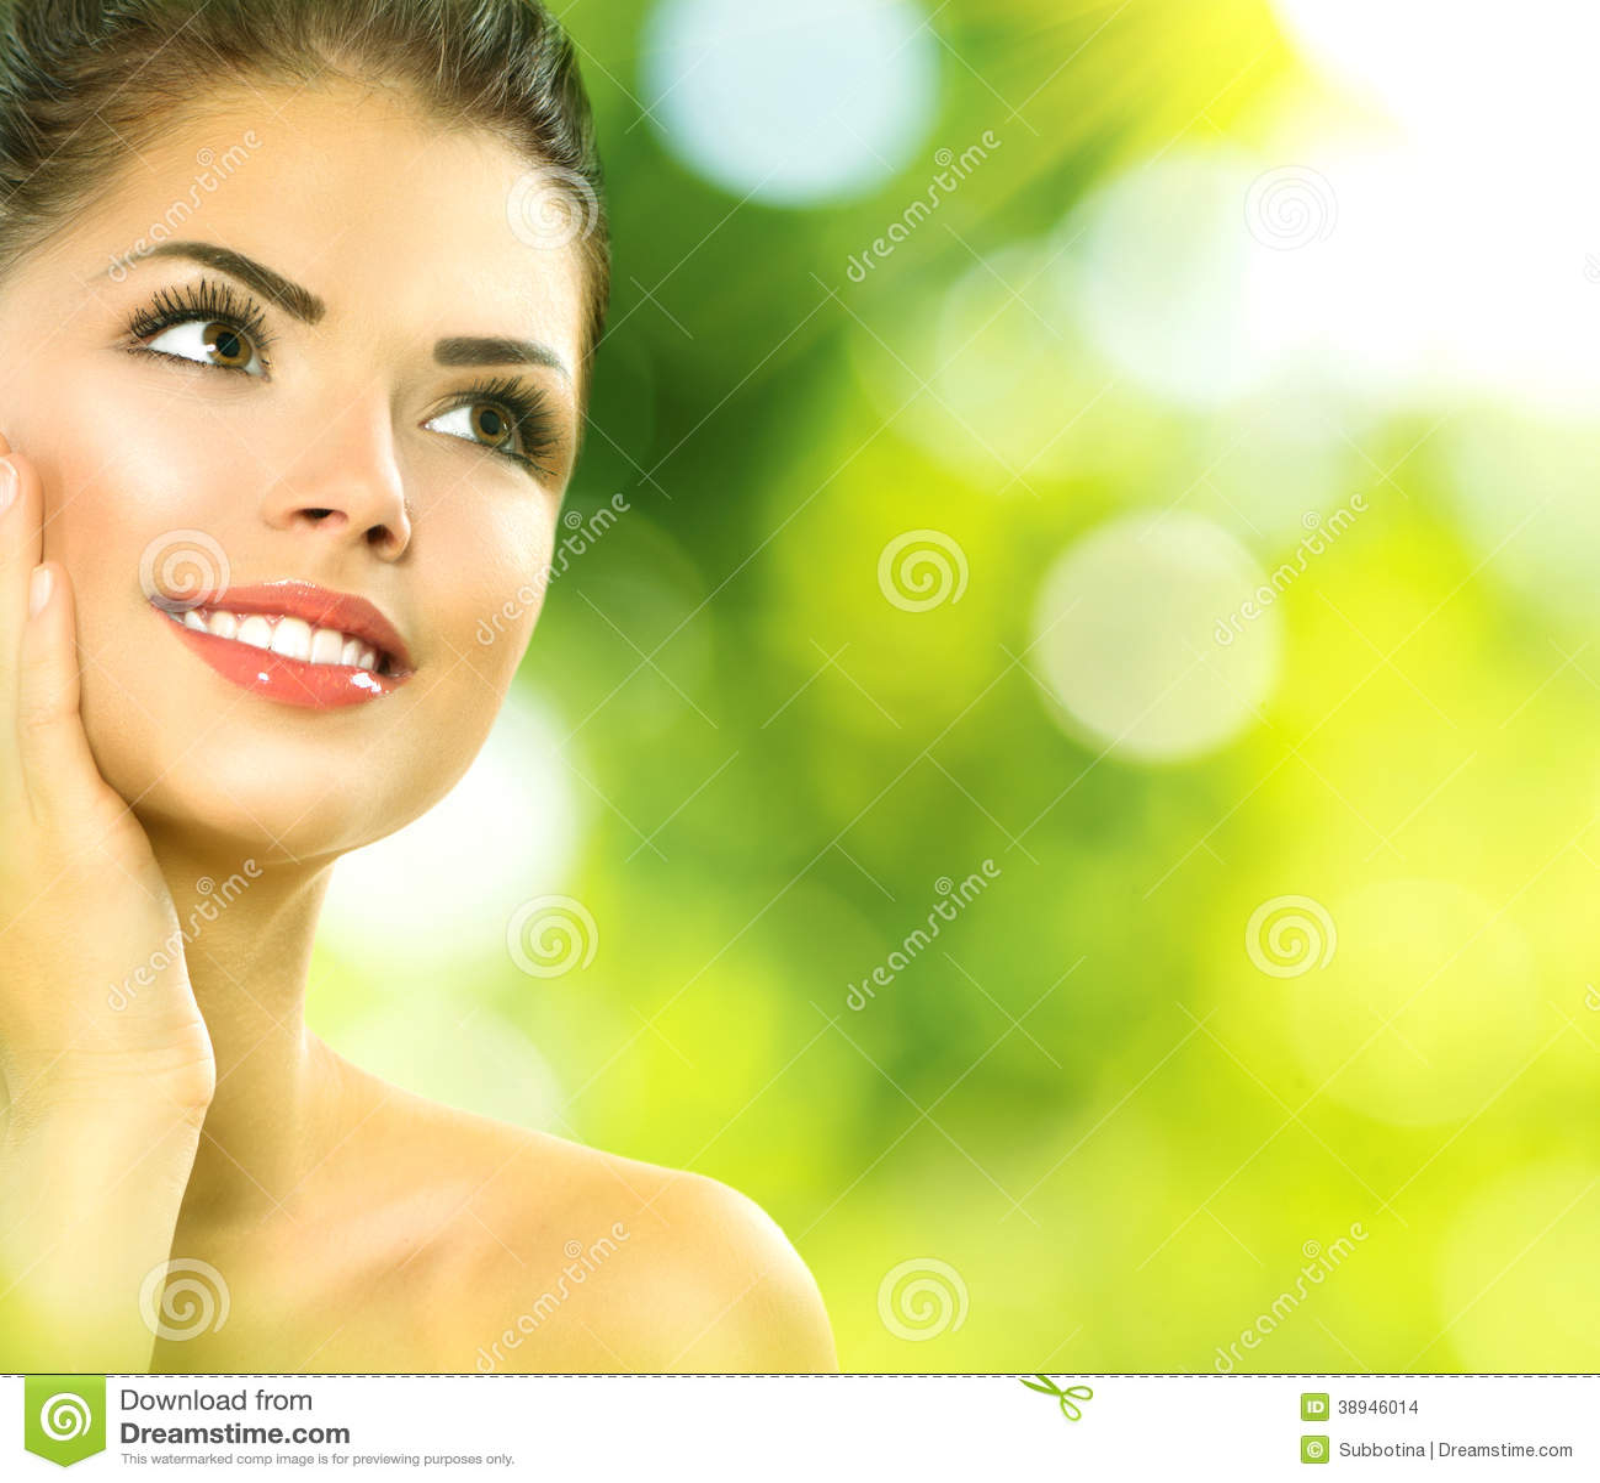 Beauty Spa Woman Outdoors